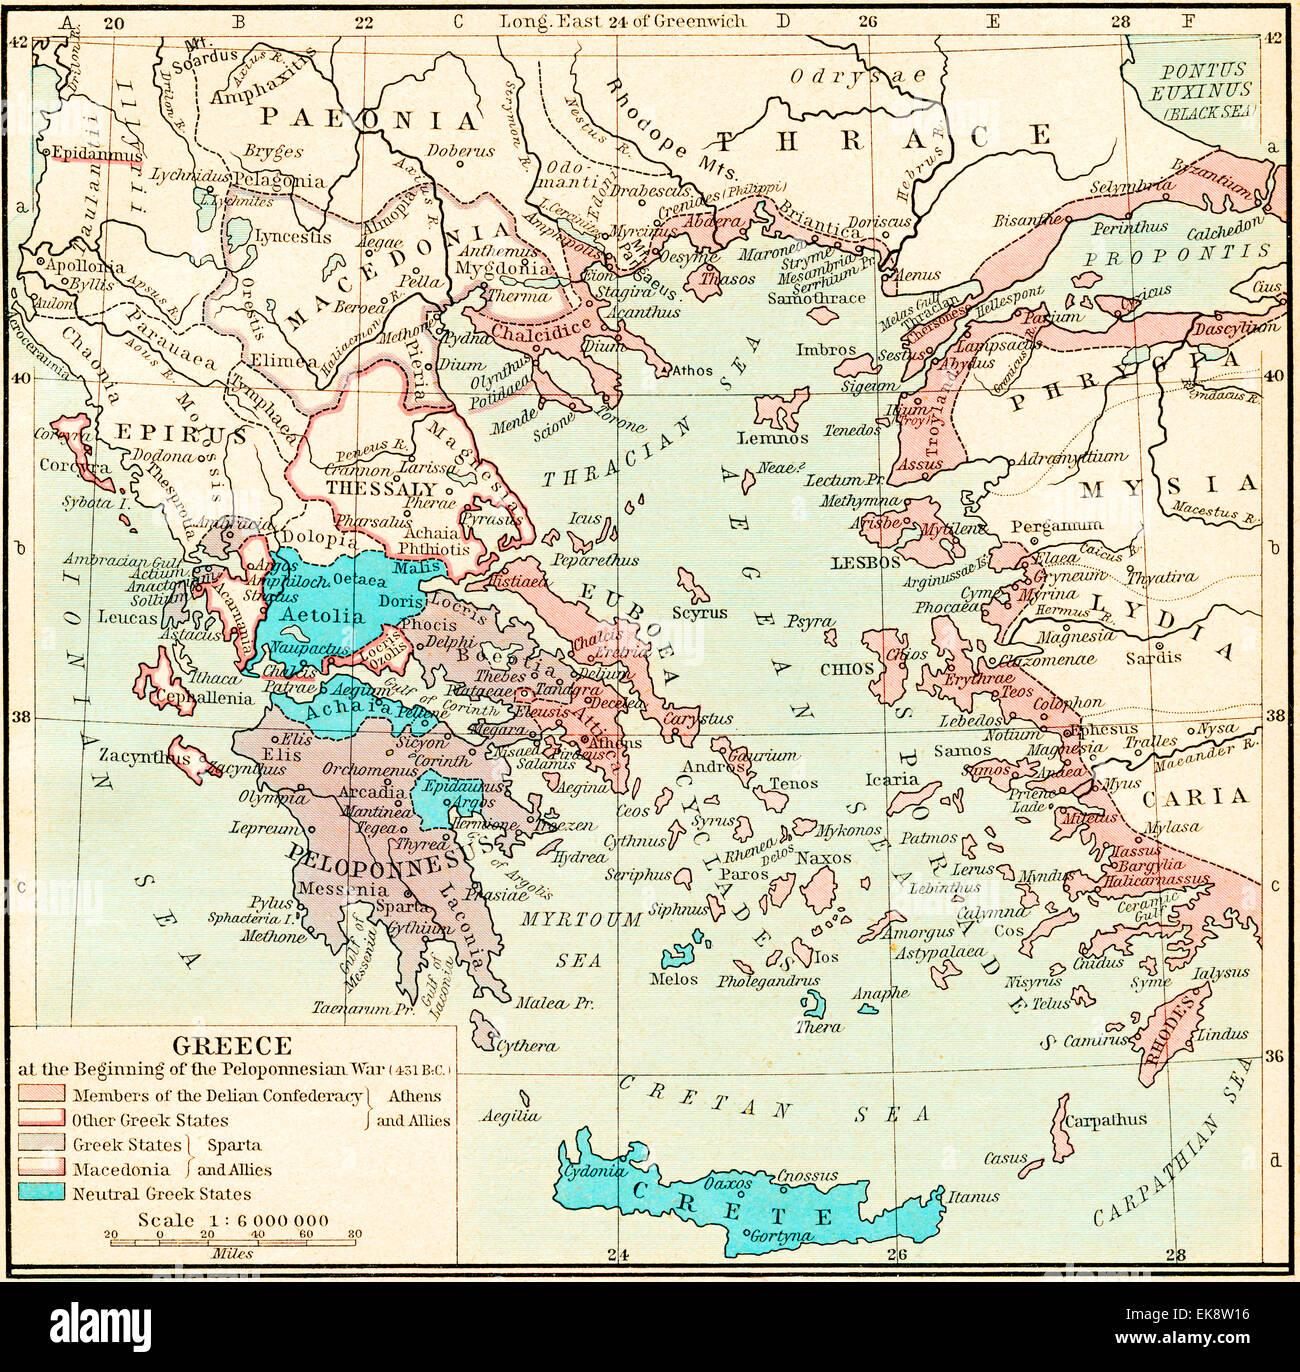 Peloponnesus Greece Map on sea of marmara greece map, magna graecia greece map, mount olympus greece map, attica greece map, thessaly greece map, macedonia greece map, hellespont greece map, ithaca greece map, delphi greece map, mycenae greece map, sparta greece map, ionia greece map, phocis greece map, pergamon greece map, boeotia greece map, laconia greece map, thrace greece map, troy greece map, epirus greece map, rhodes greece map,